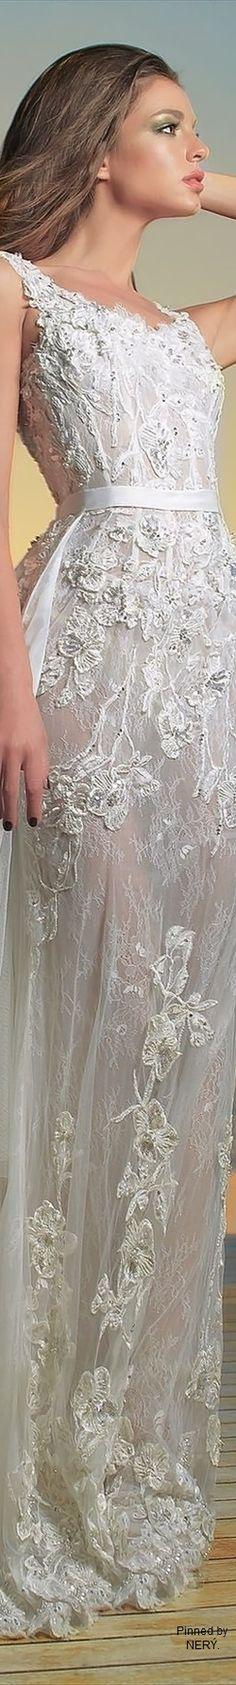 Charbel Karam Bridal 2016